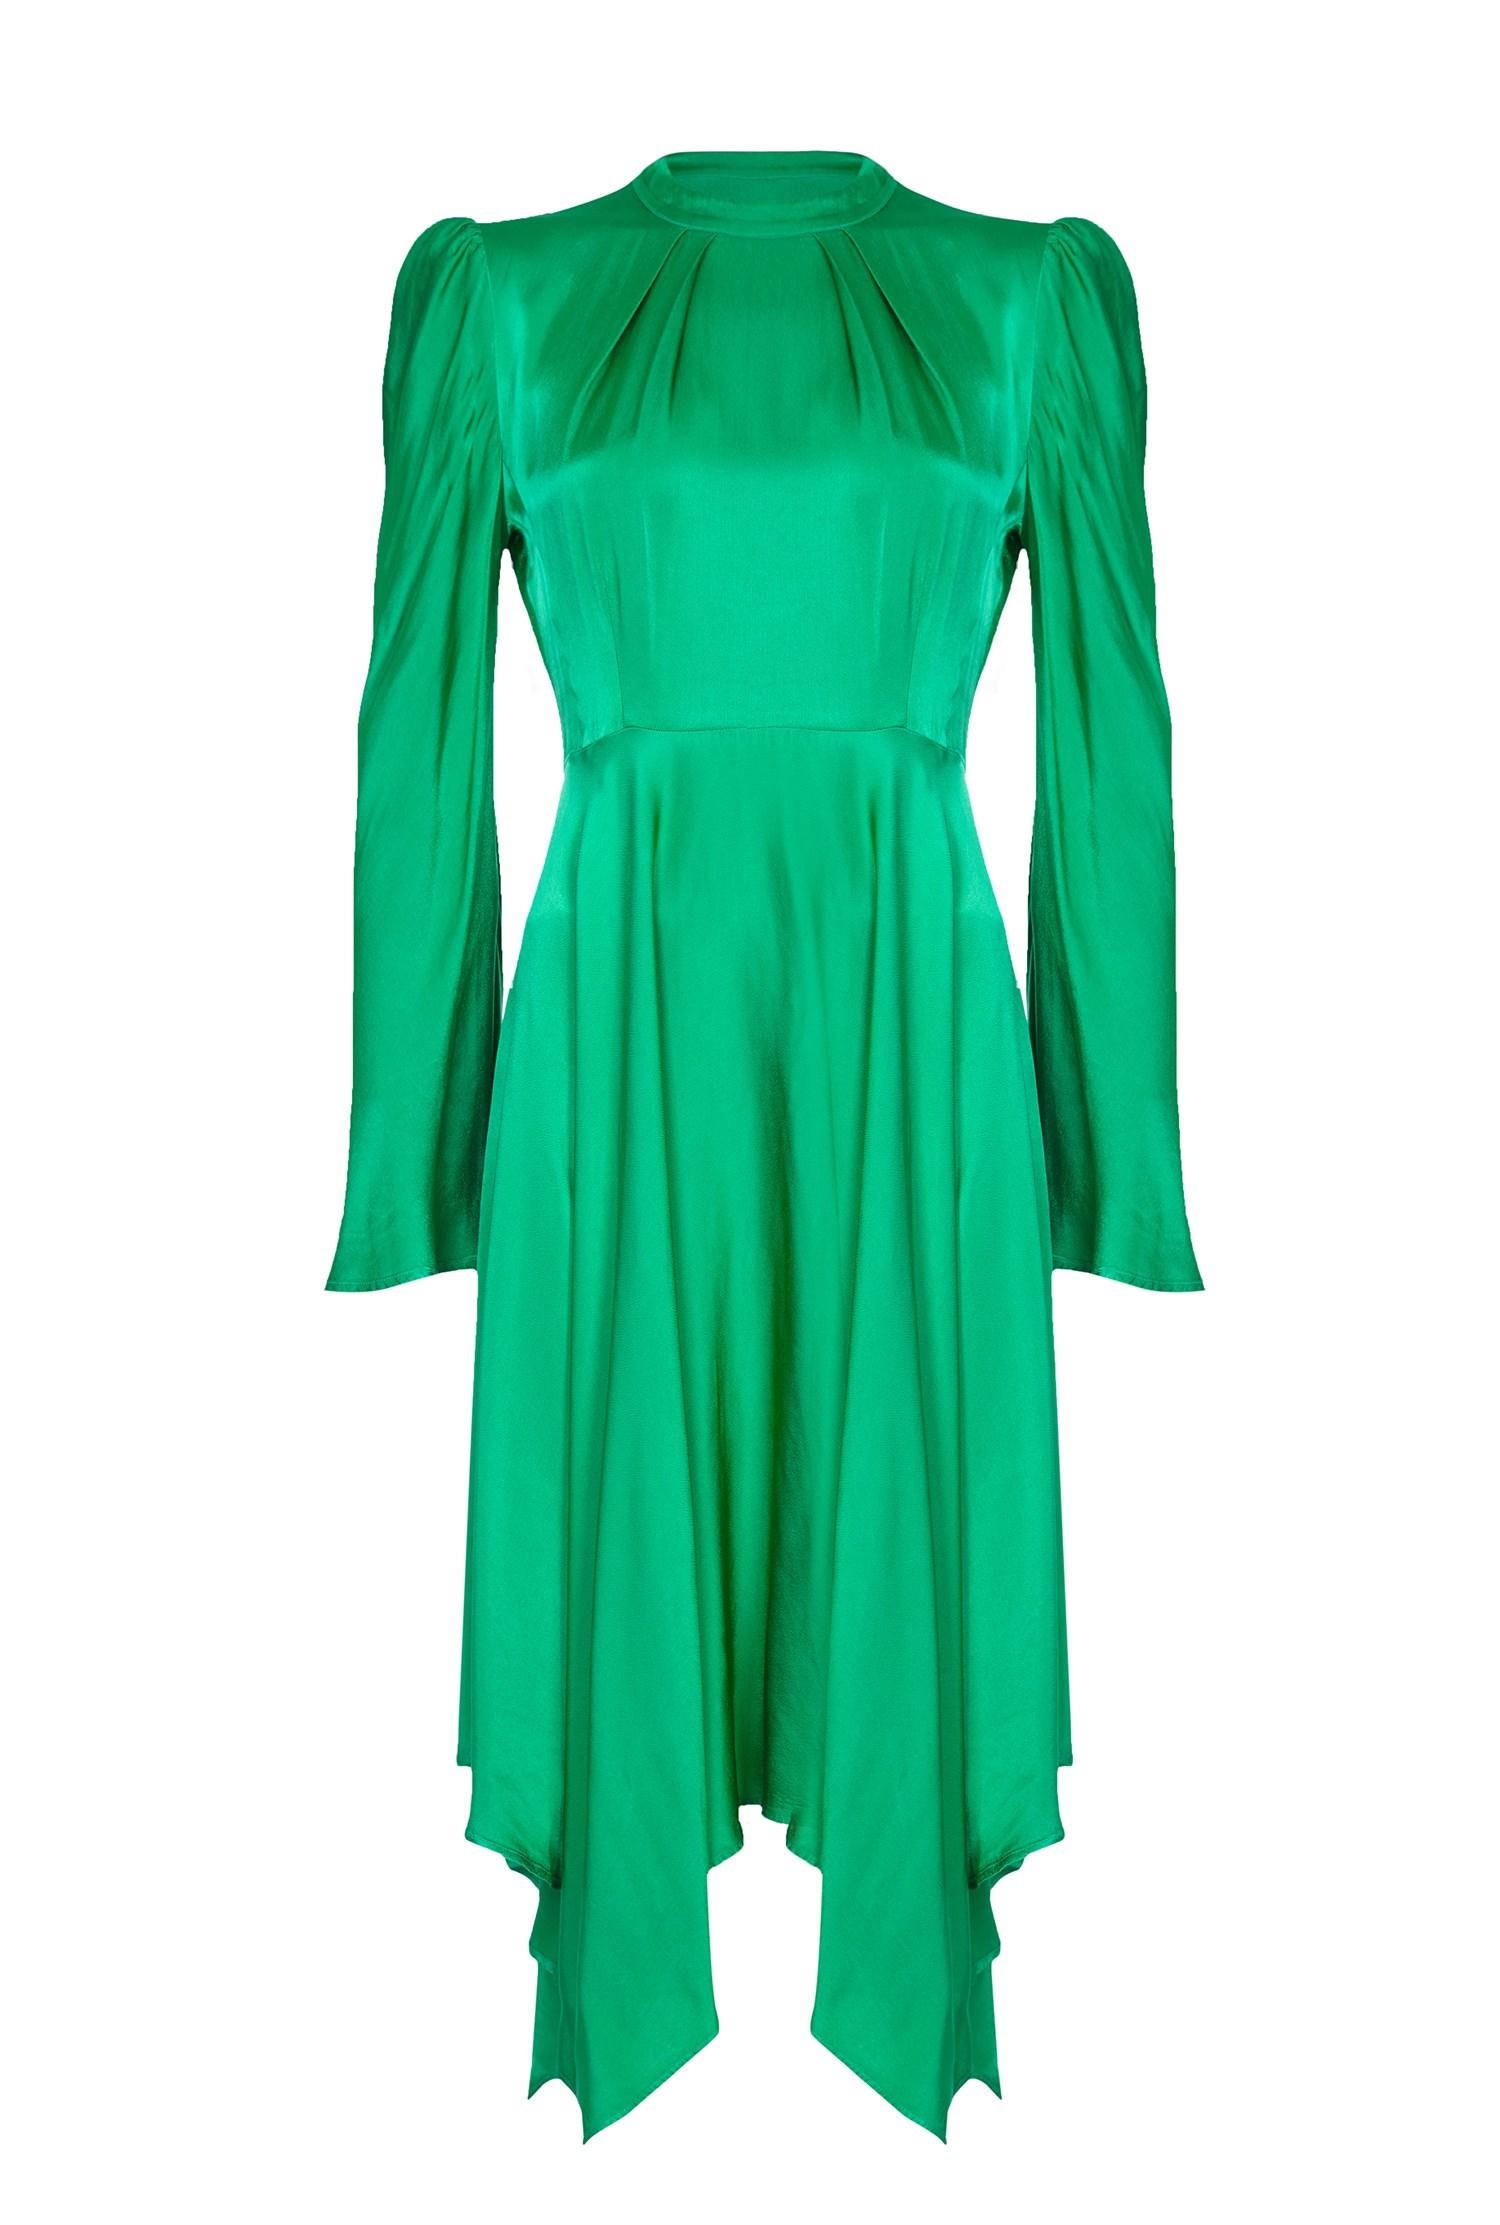 GHOST HOLLIE DRESS